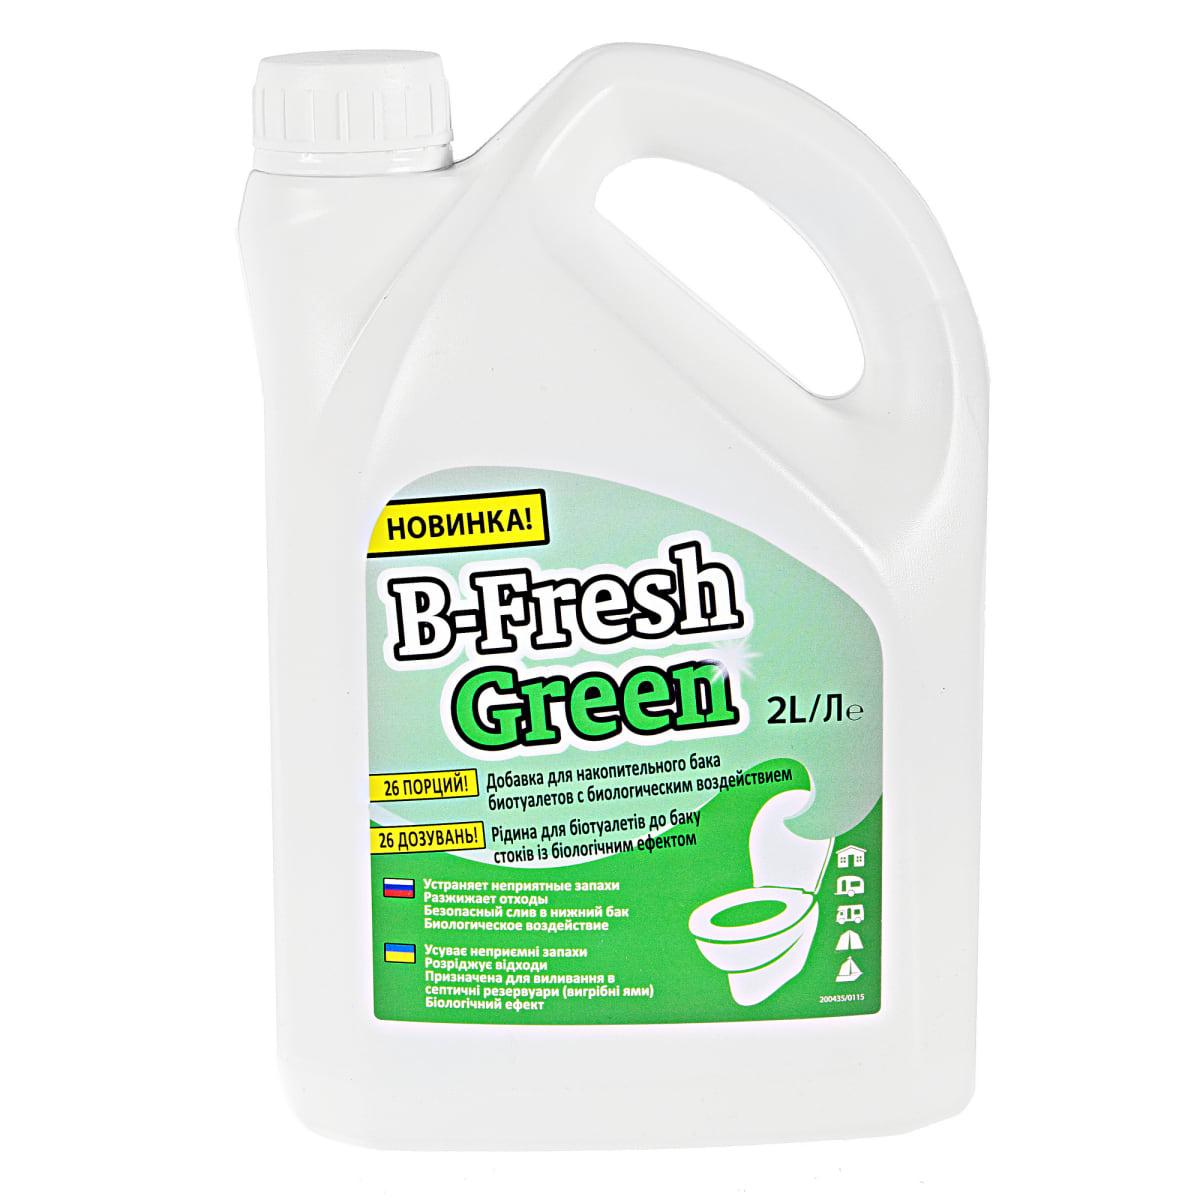 Туалетная жидкость B-Fresh Green, 2 л